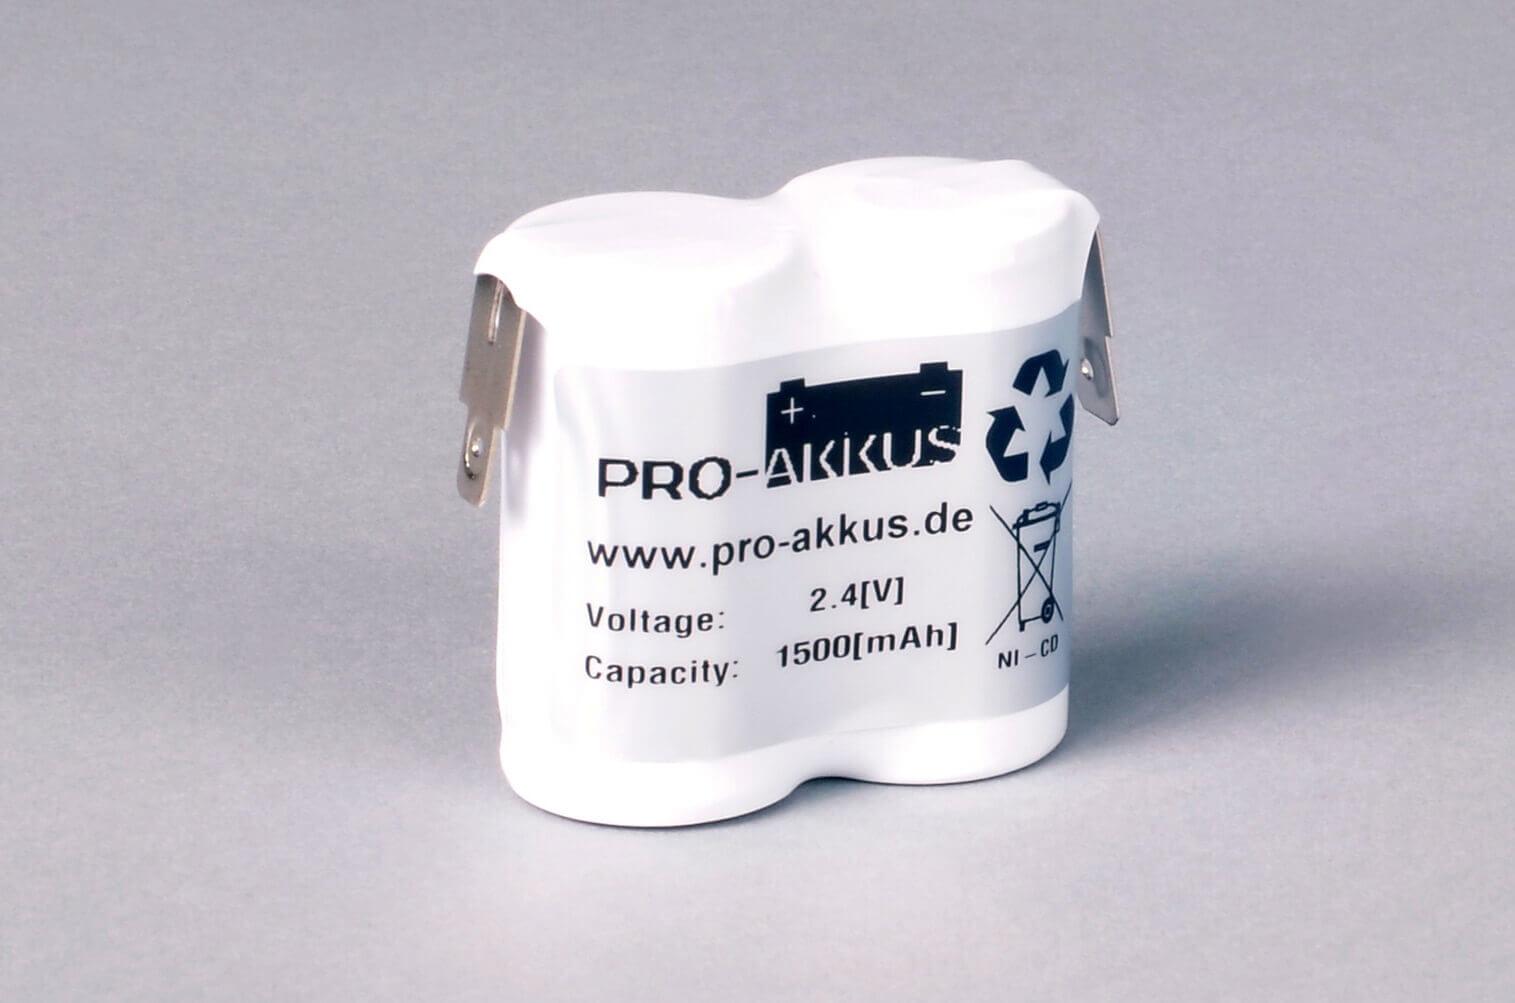 Ni-Cd Akkupack Notlicht Notbeleuchtung 2,4V / 1500mAh (1,5Ah) F2x1 Reihe, Faston Anschlüsse